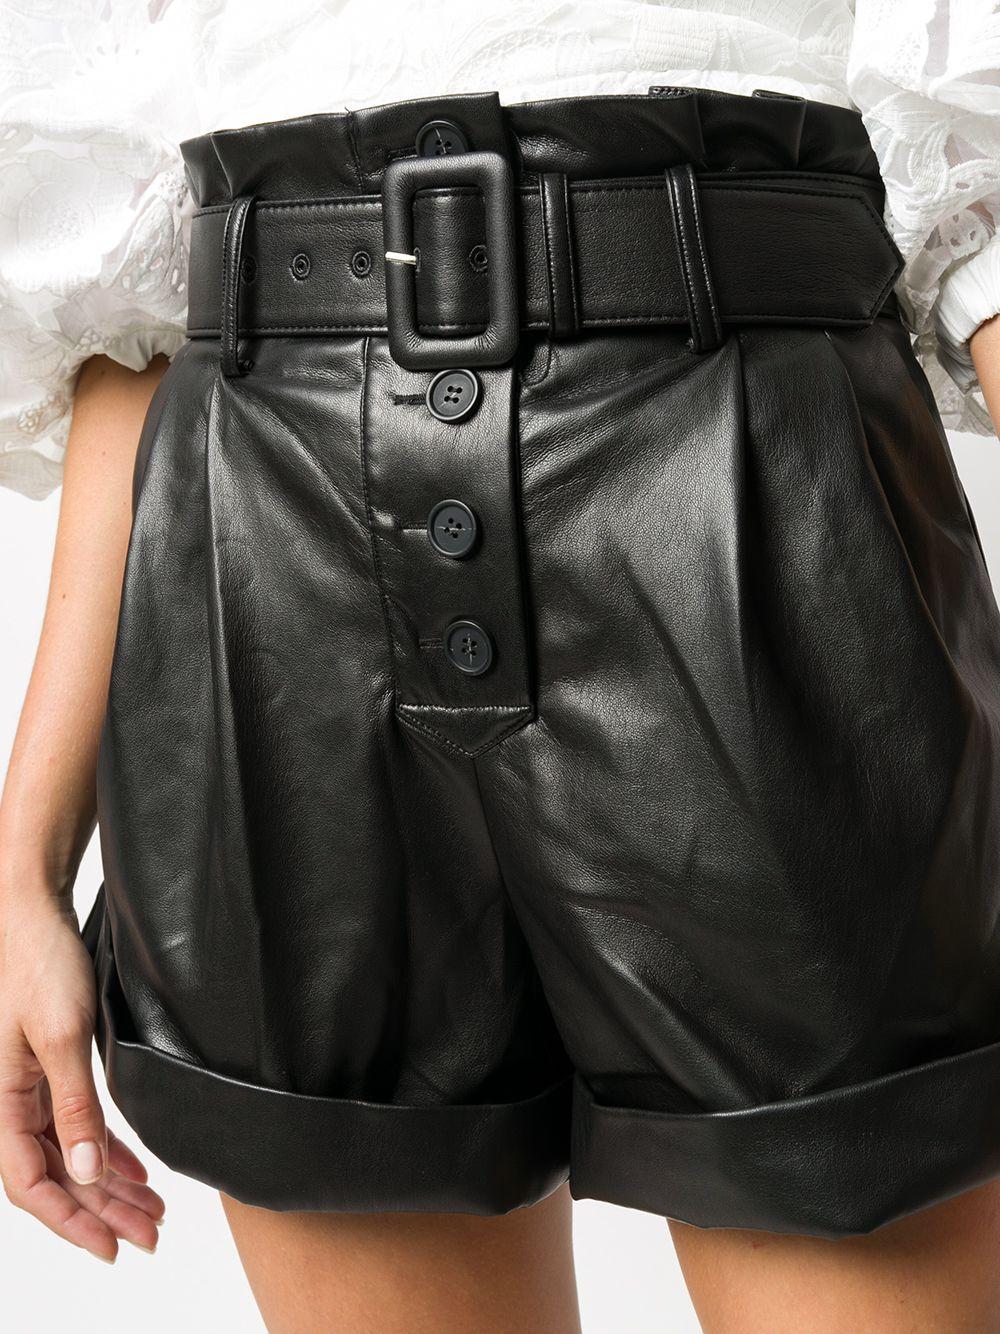 SELF-PORTRAIT SELF-PORTRAIT | Shorts | PF20135BLK